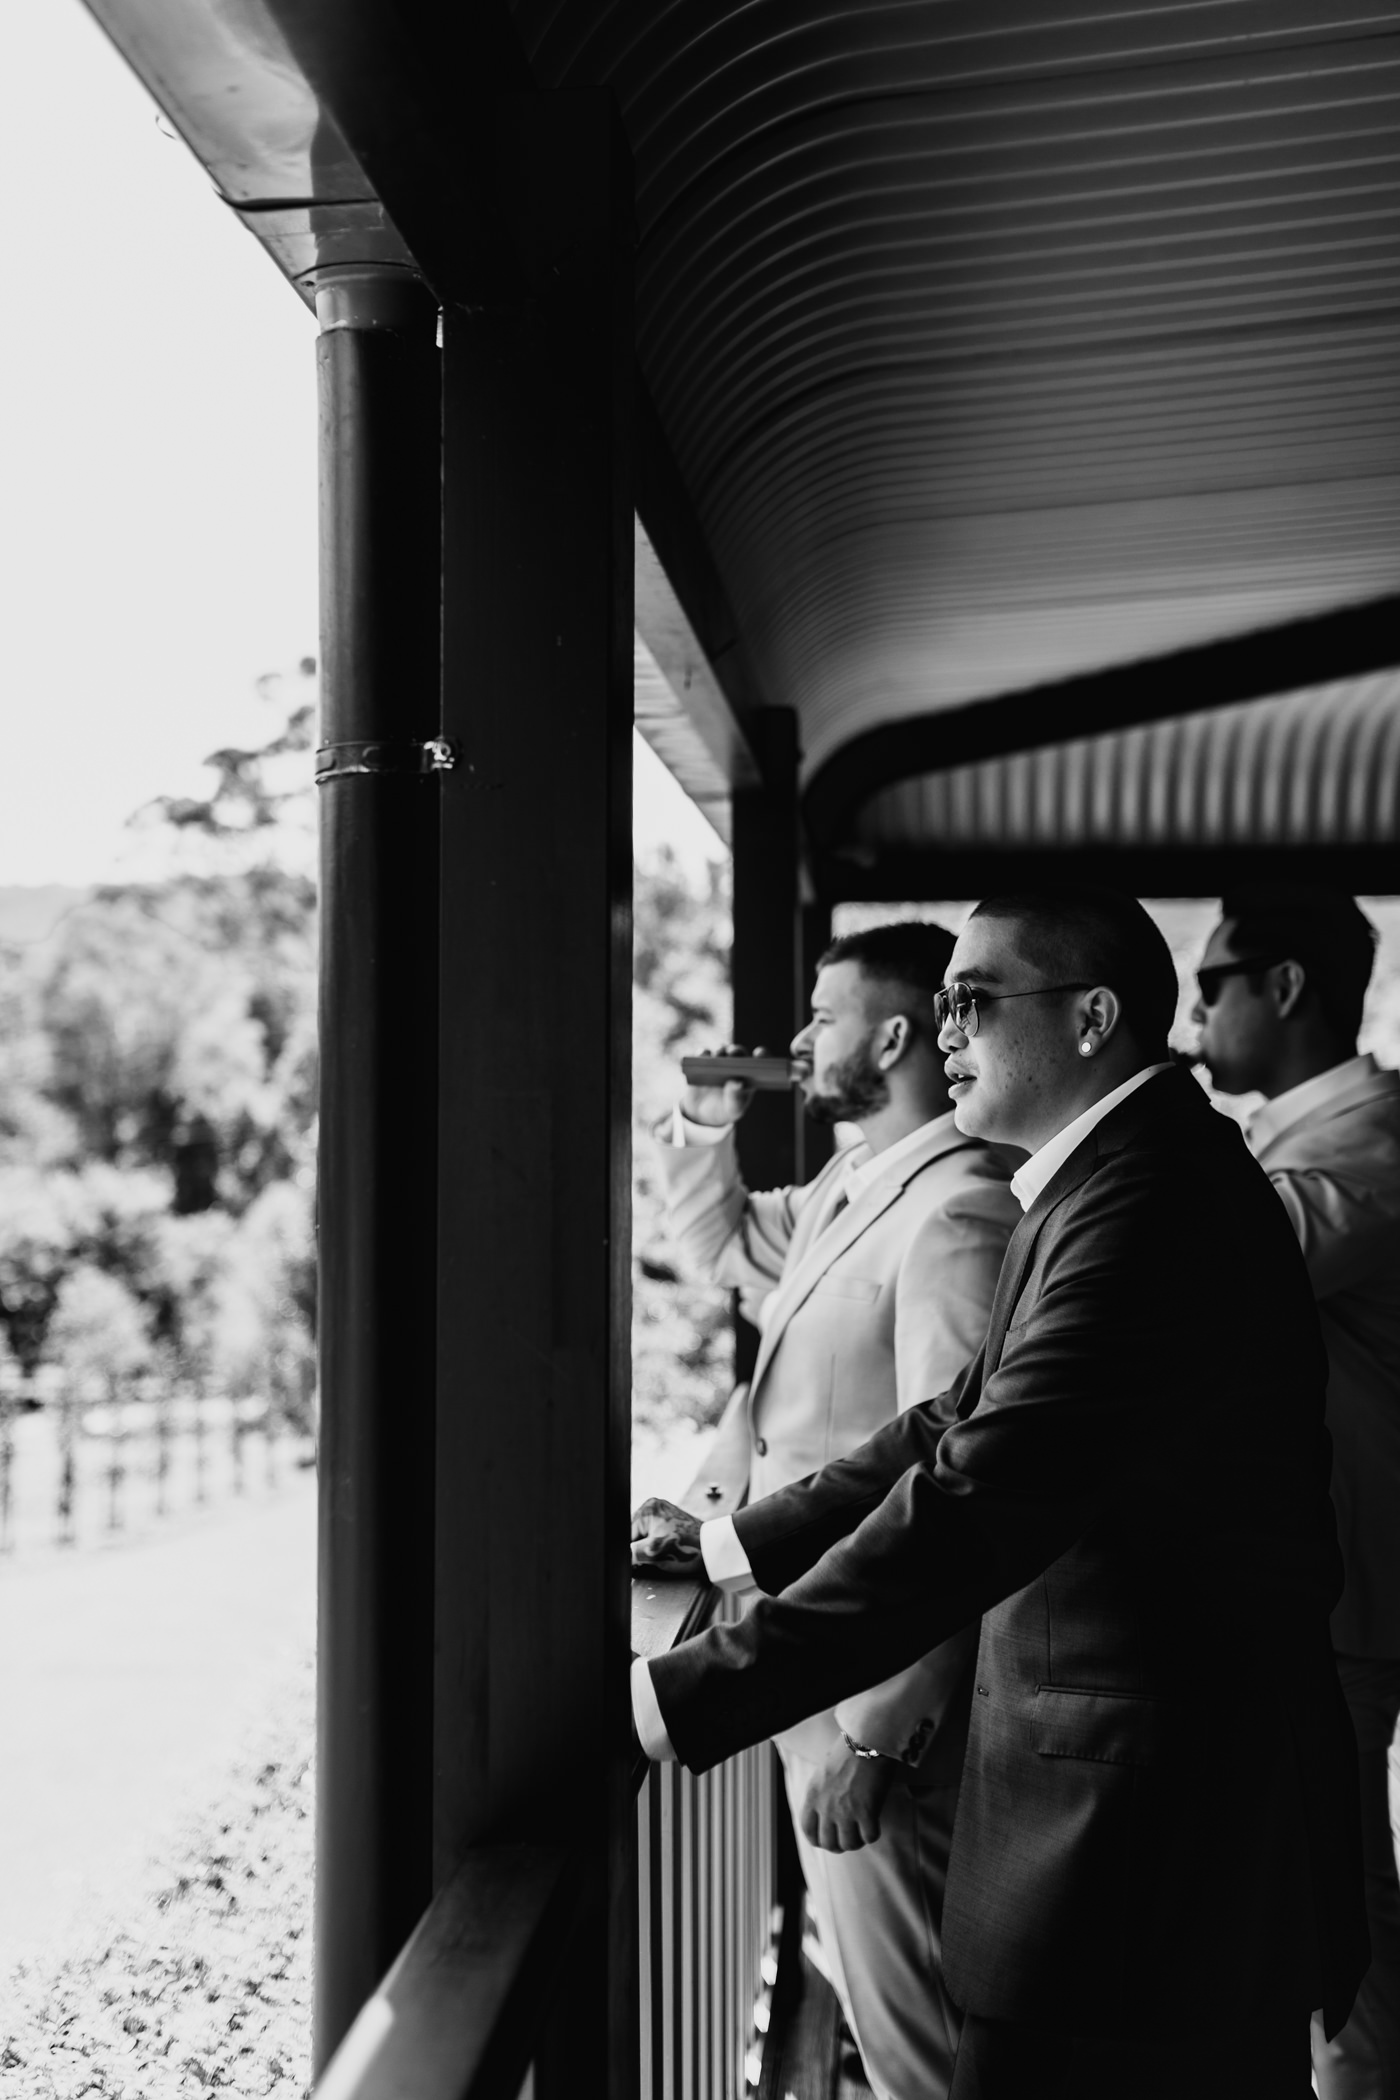 Nick & Vanezza - Fernbank Farm Wedding - Samantha Heather Photography-7.jpg